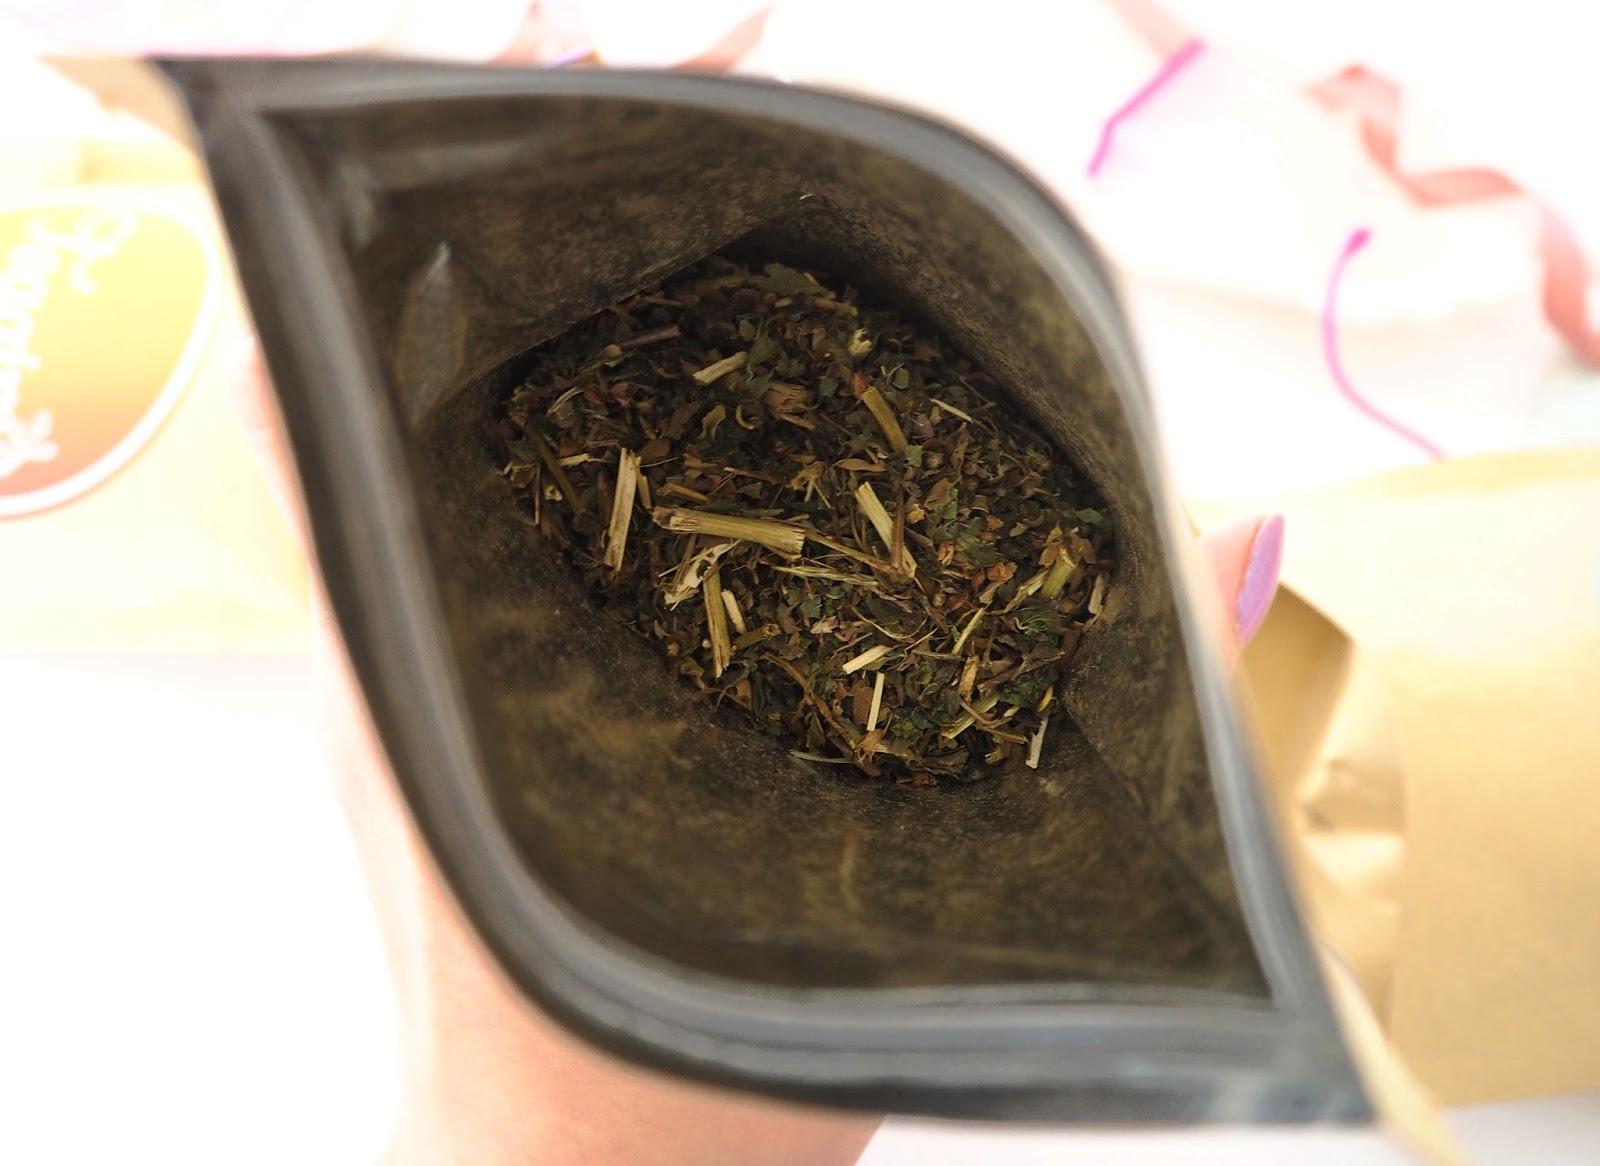 Teatox with Teagime, Katie Kirk Loves, UK Blogger, Herbal Tea, Detox, Tea Regime, Lifestyle Blogger, Food Blogger, Health Blogger, Healthy Lifestyle, Weight Loss